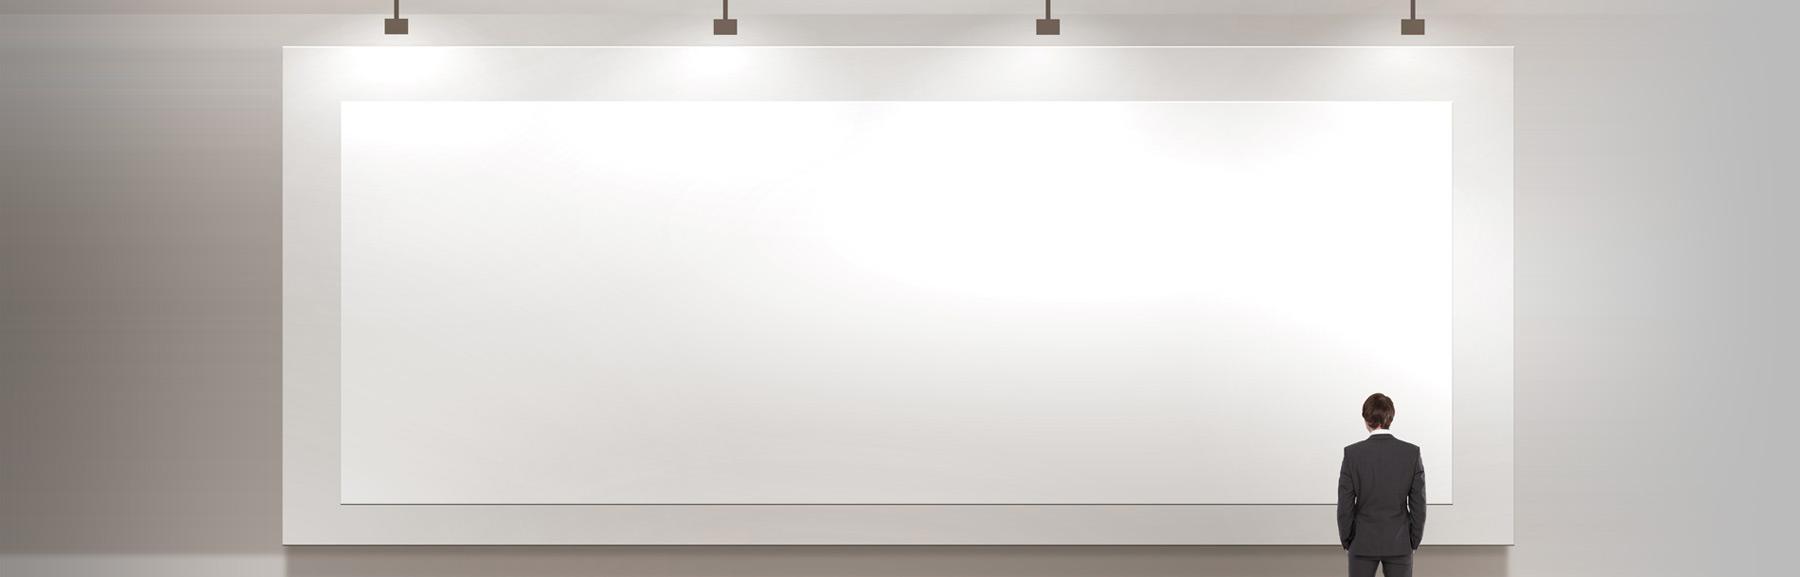 webinar-banner